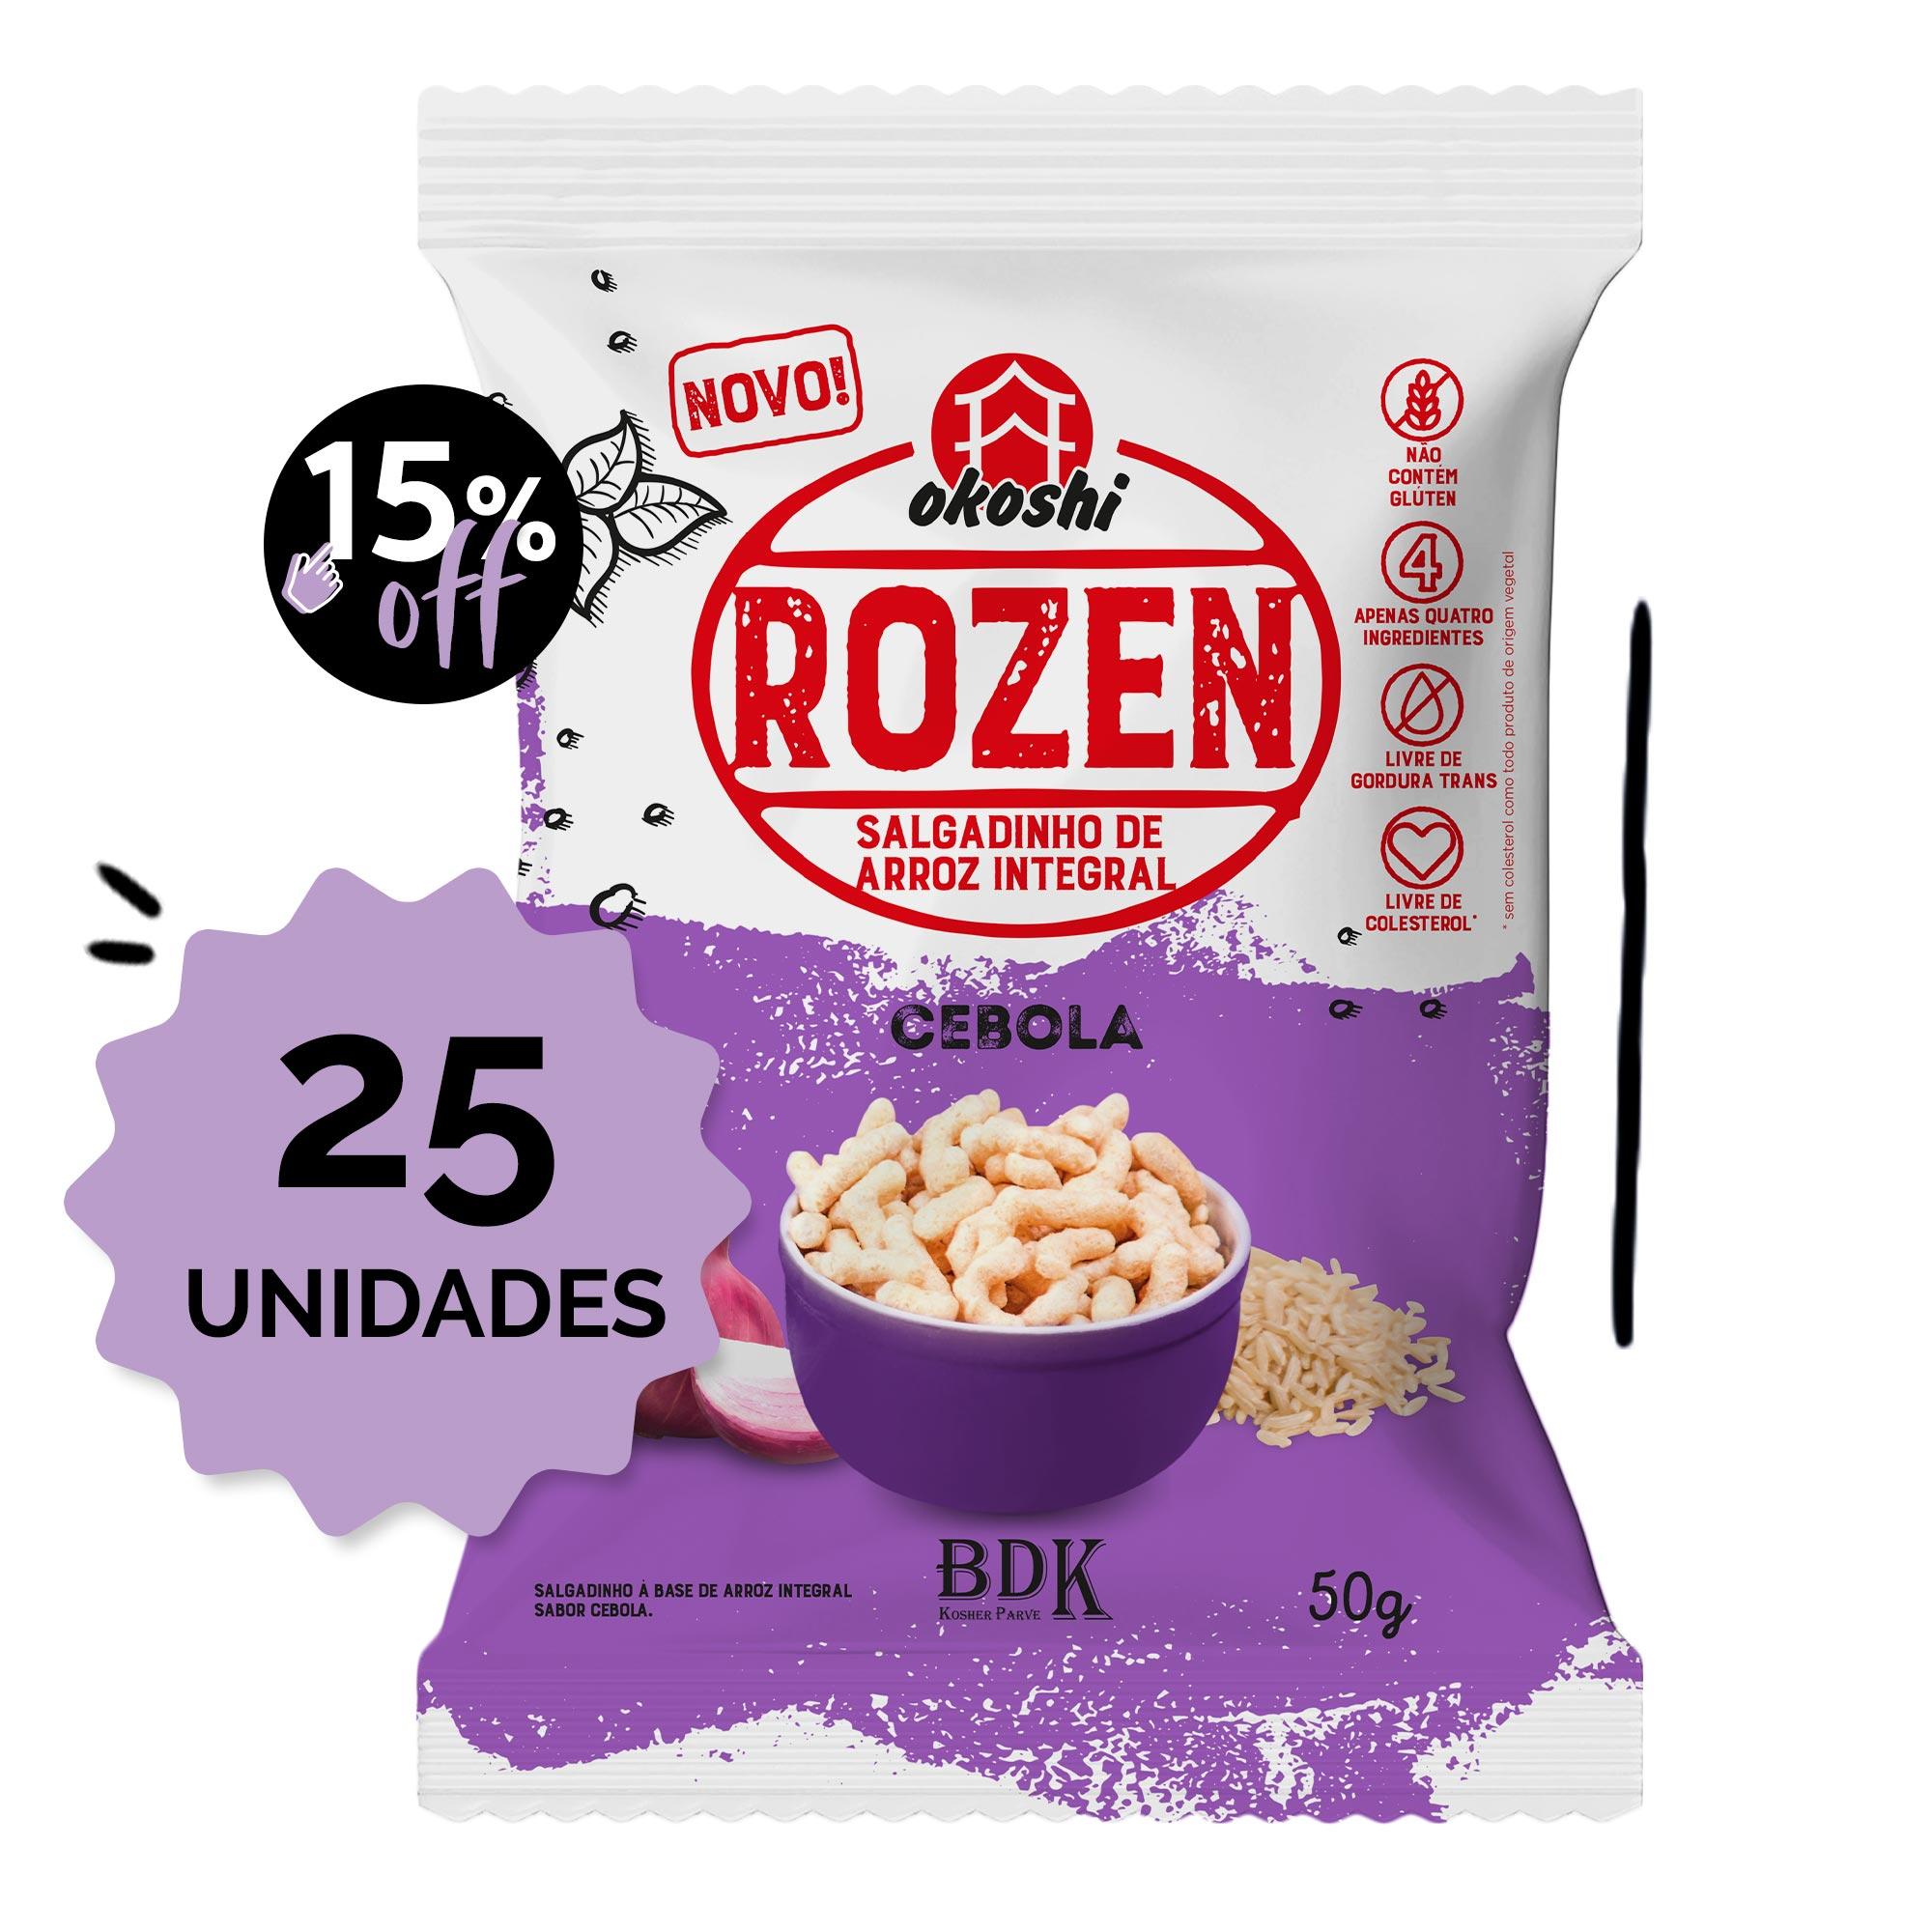 SUPER PACK 25 unidades - Rozen Cebola